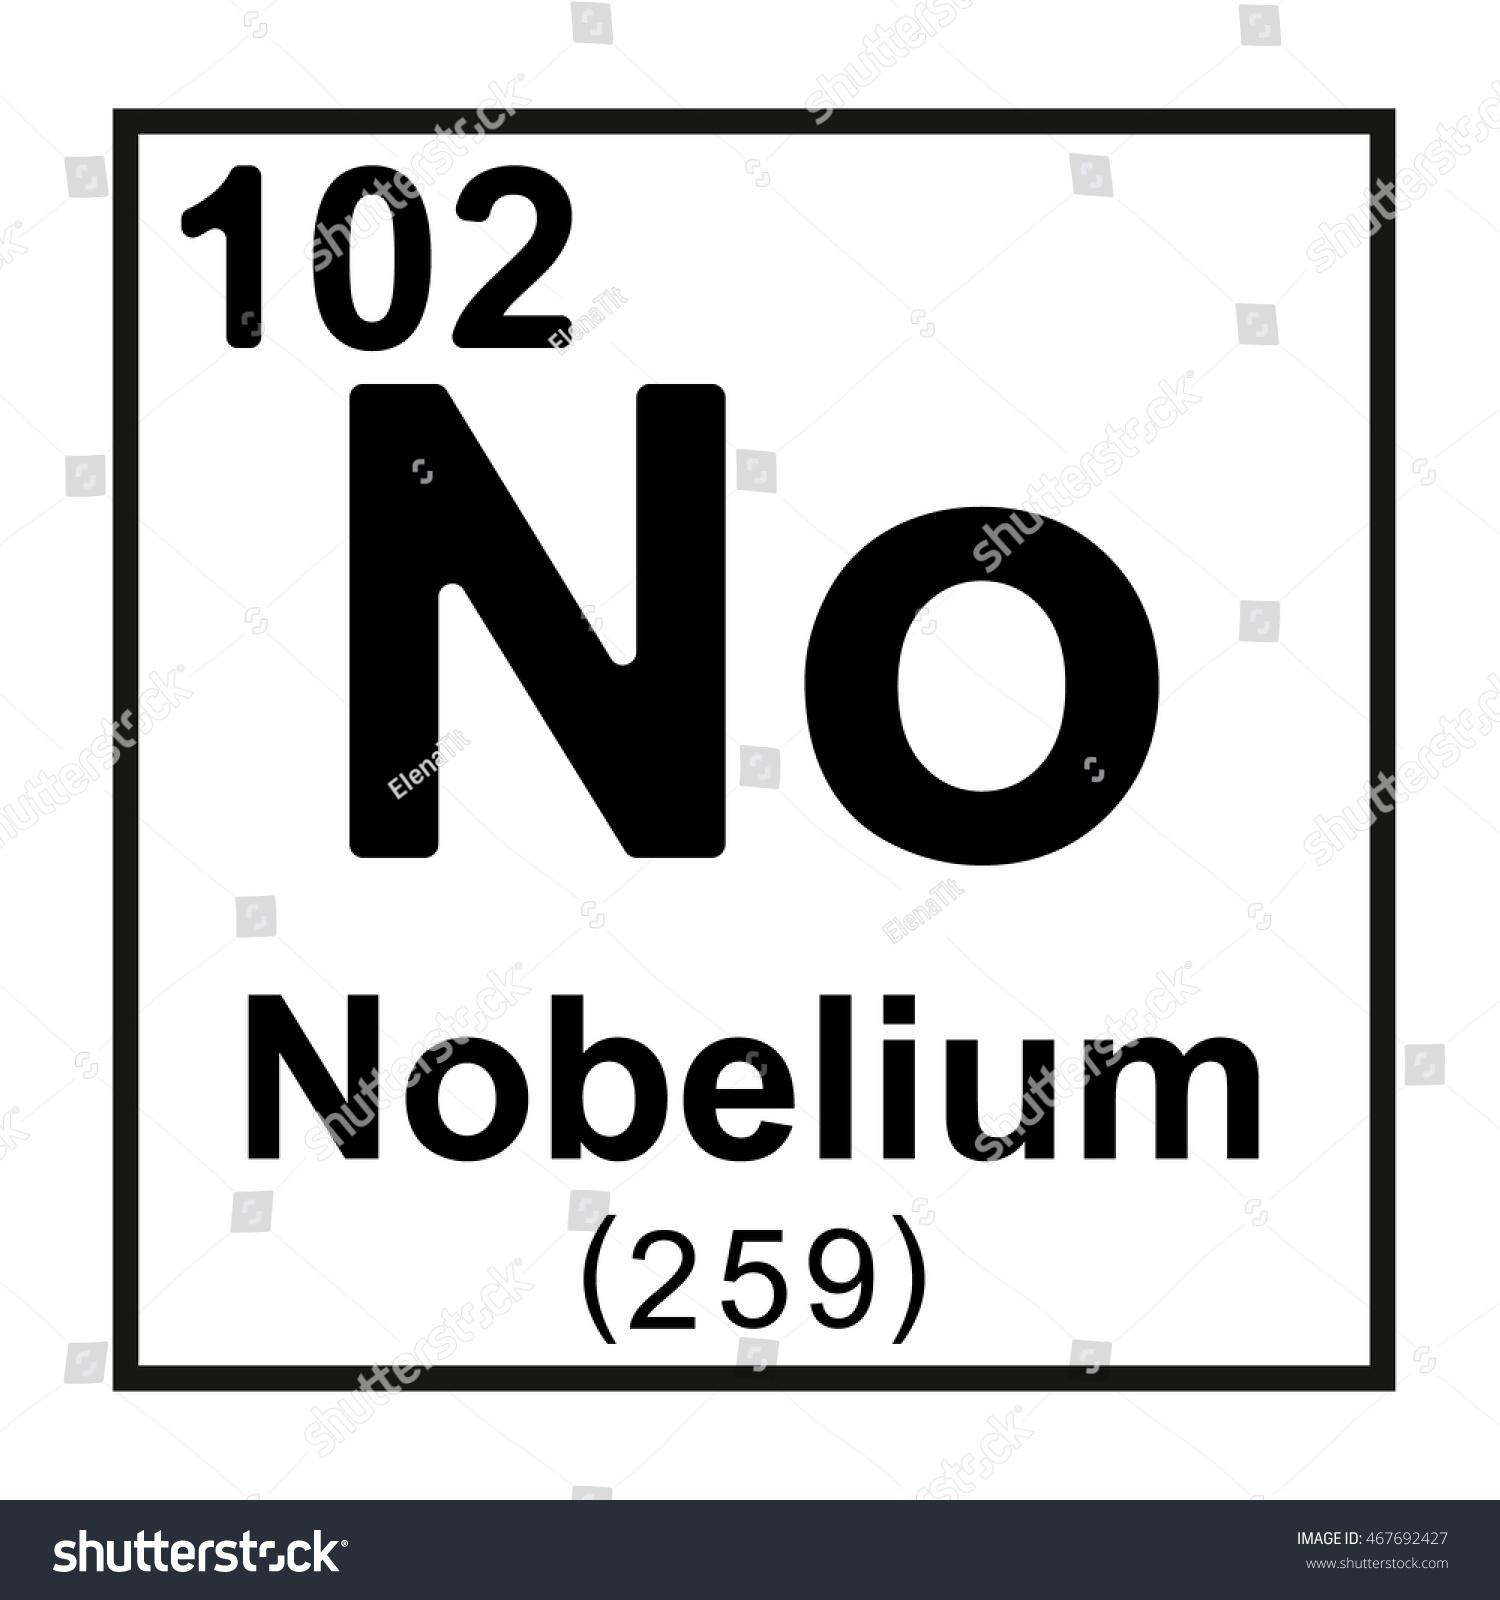 Periodic table element nobelium stock vector 467692427 shutterstock periodic table element nobelium gamestrikefo Choice Image